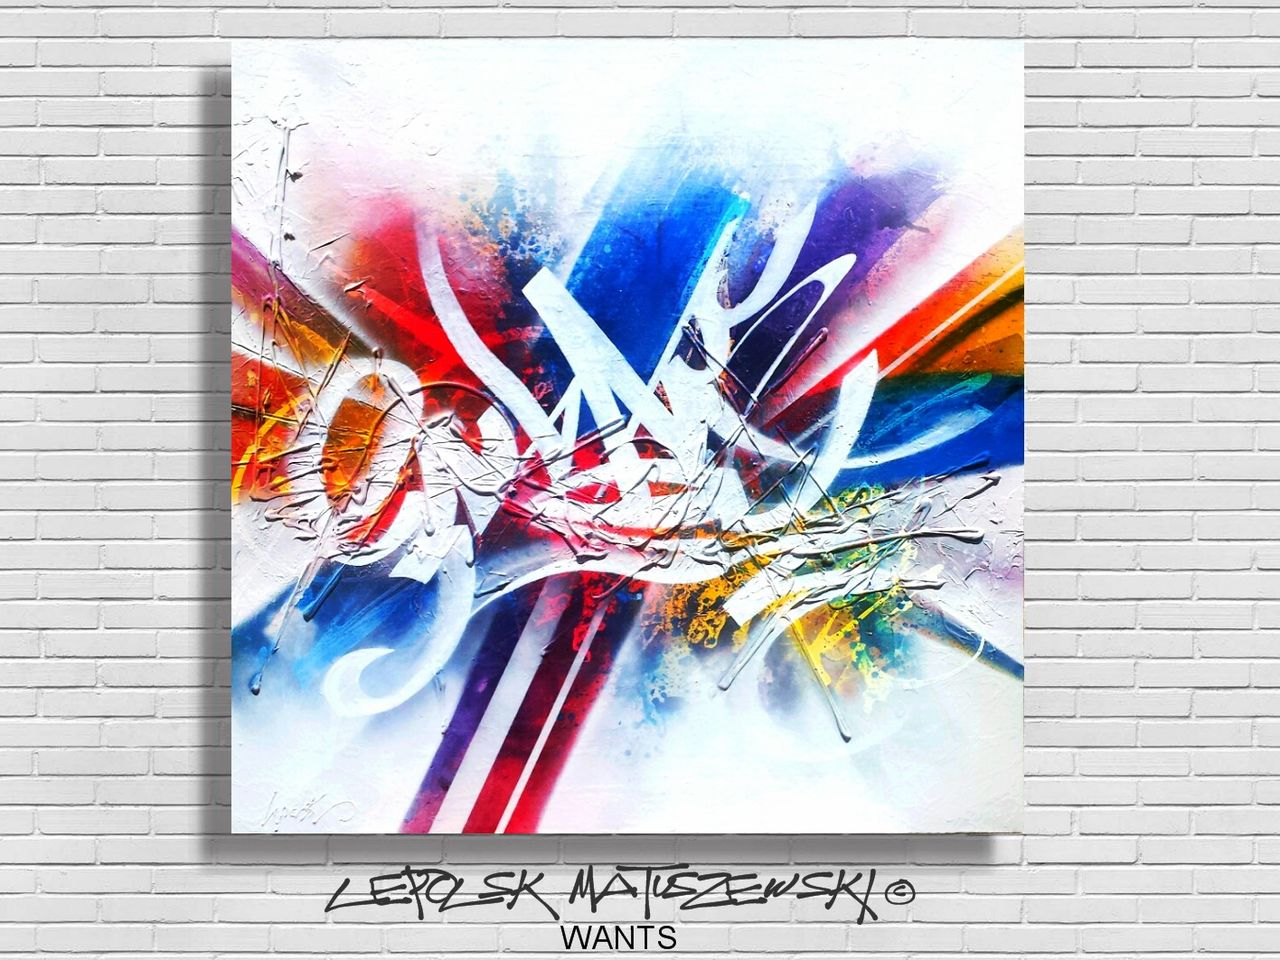 LEPOLSK MATUSZEWSKI WANTS by Lepolsk 2016 abstract art calligrafftii